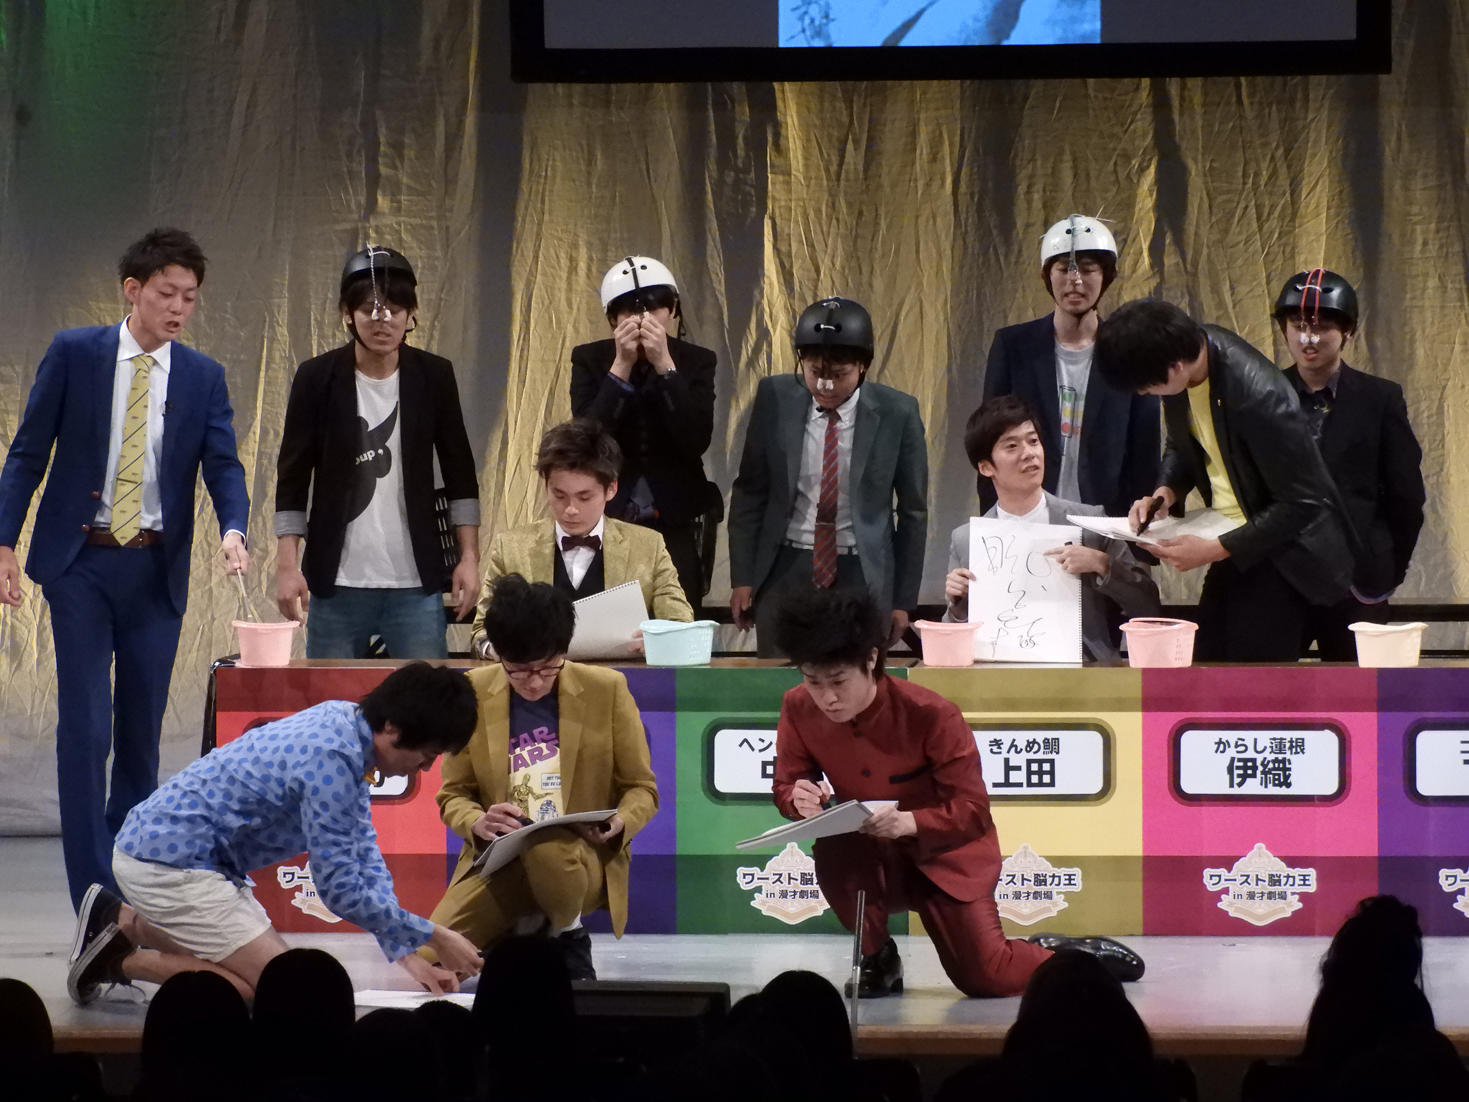 http://news.yoshimoto.co.jp/20180406112214-351b88dedbdf2b5e00d0b0b49e623c96b37f89ad.jpg